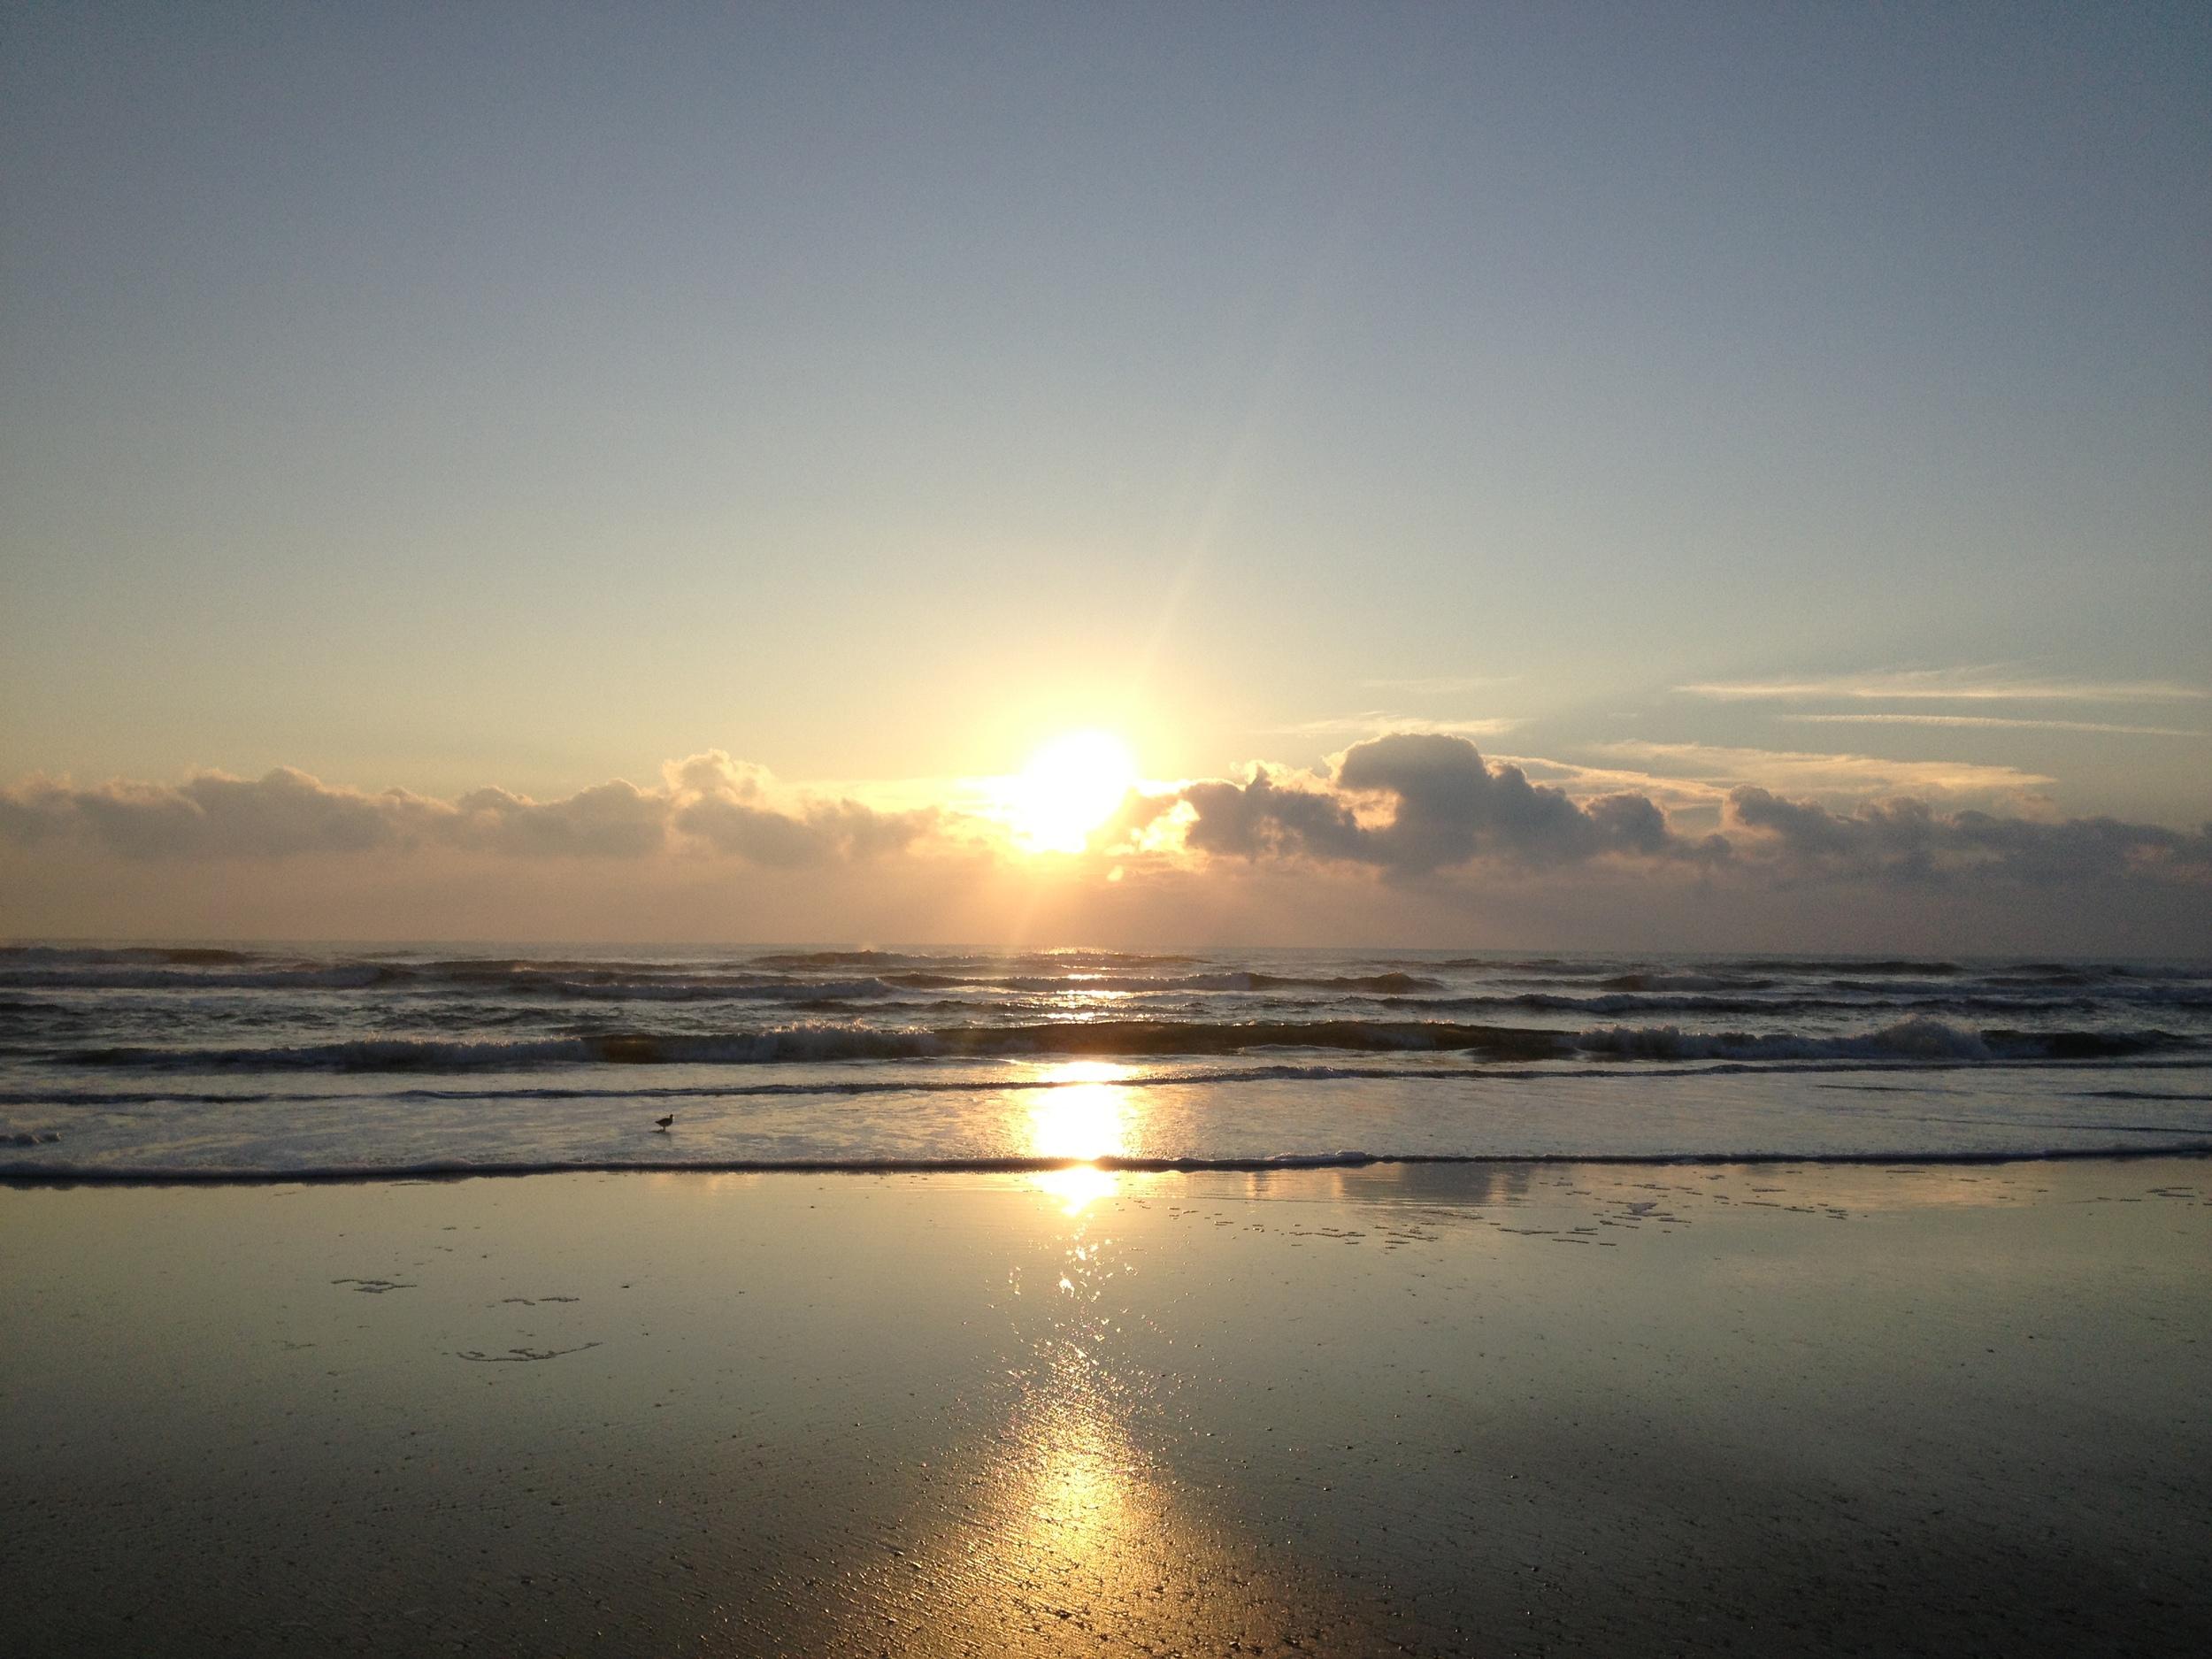 Sunrise, St. Augustine, October 10 2012